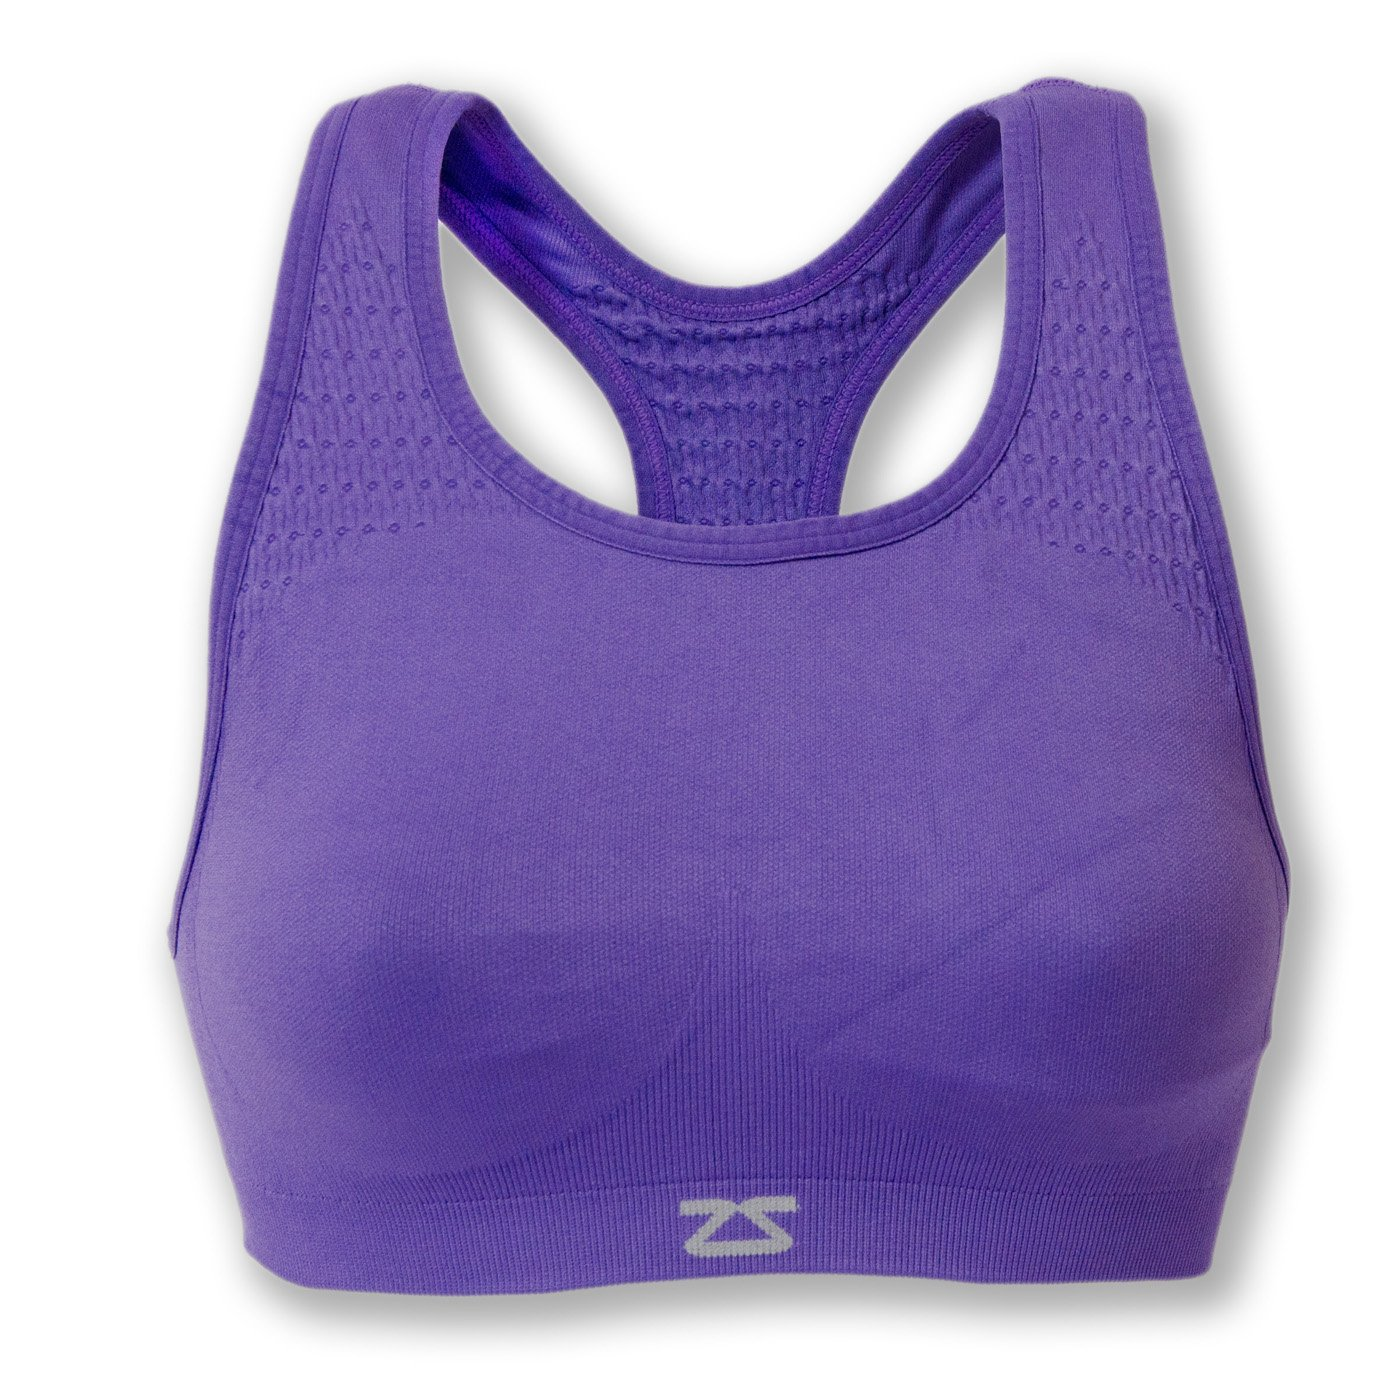 Zensah Seamless Sports Bra - Best Sports Bra for Running, Comfortable Sports Bra,Purple,Medium/Large by Zensah